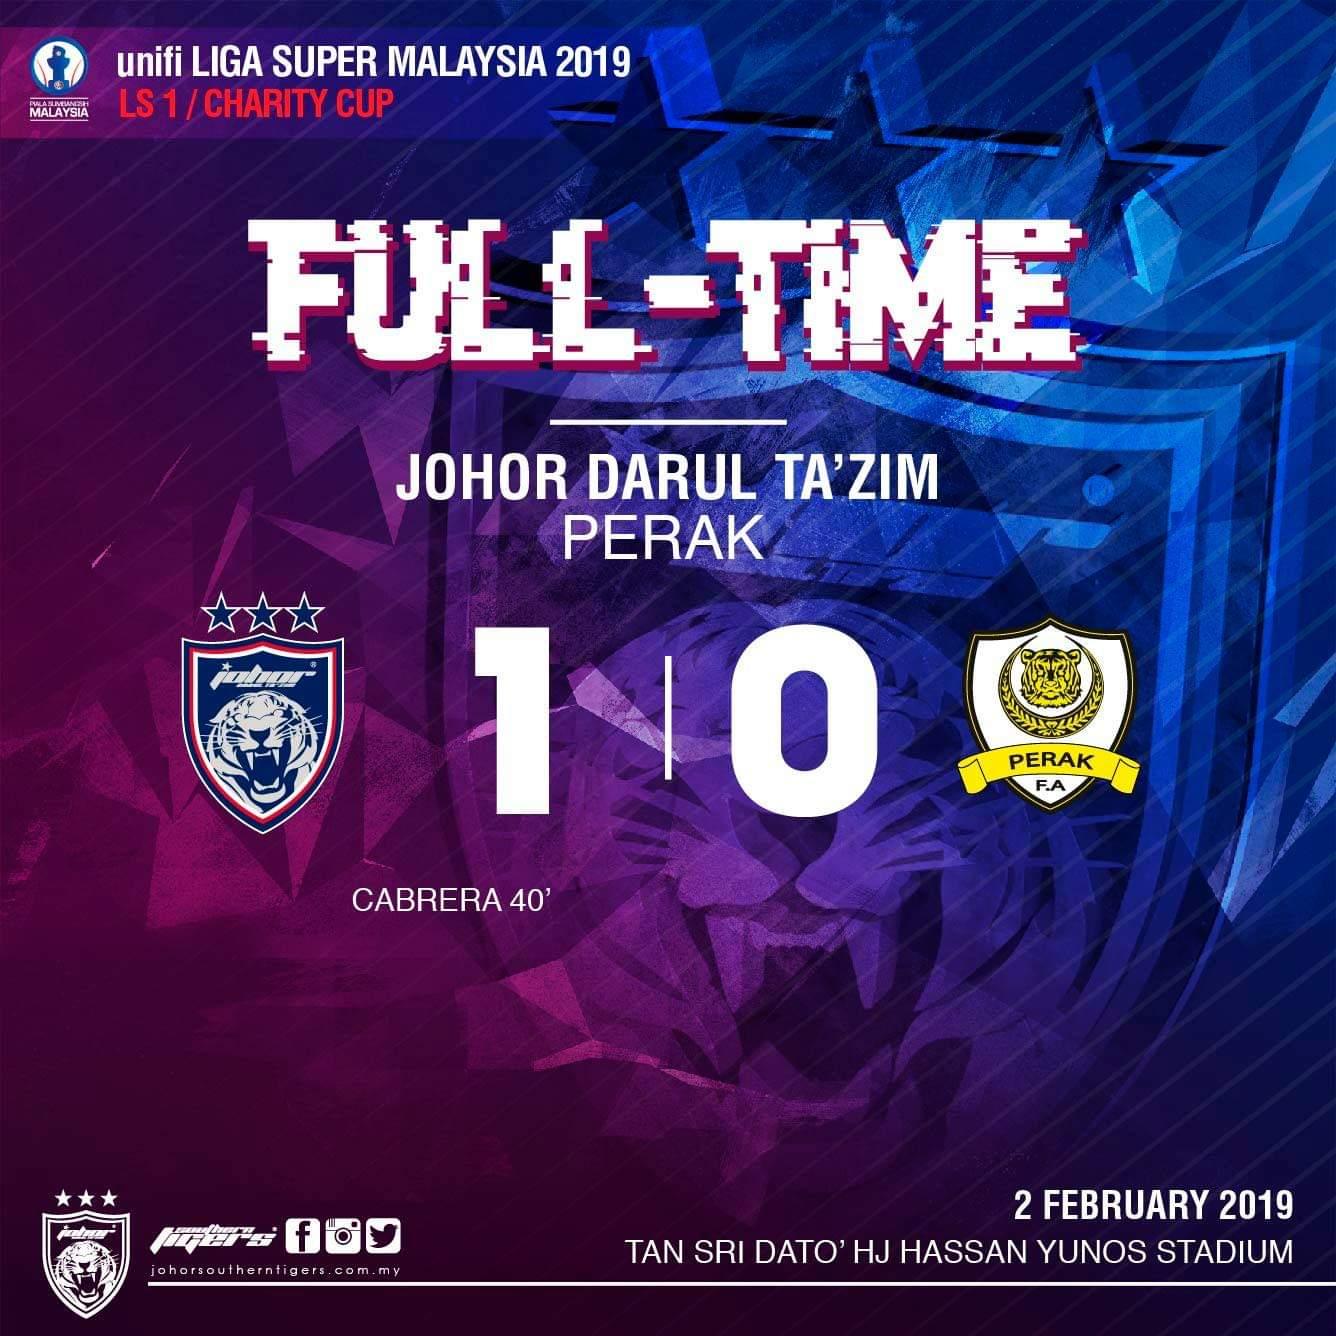 JDT Juara Piala Sumbangsih 2019, Hasil Gol Chip Cabrera Menarik!